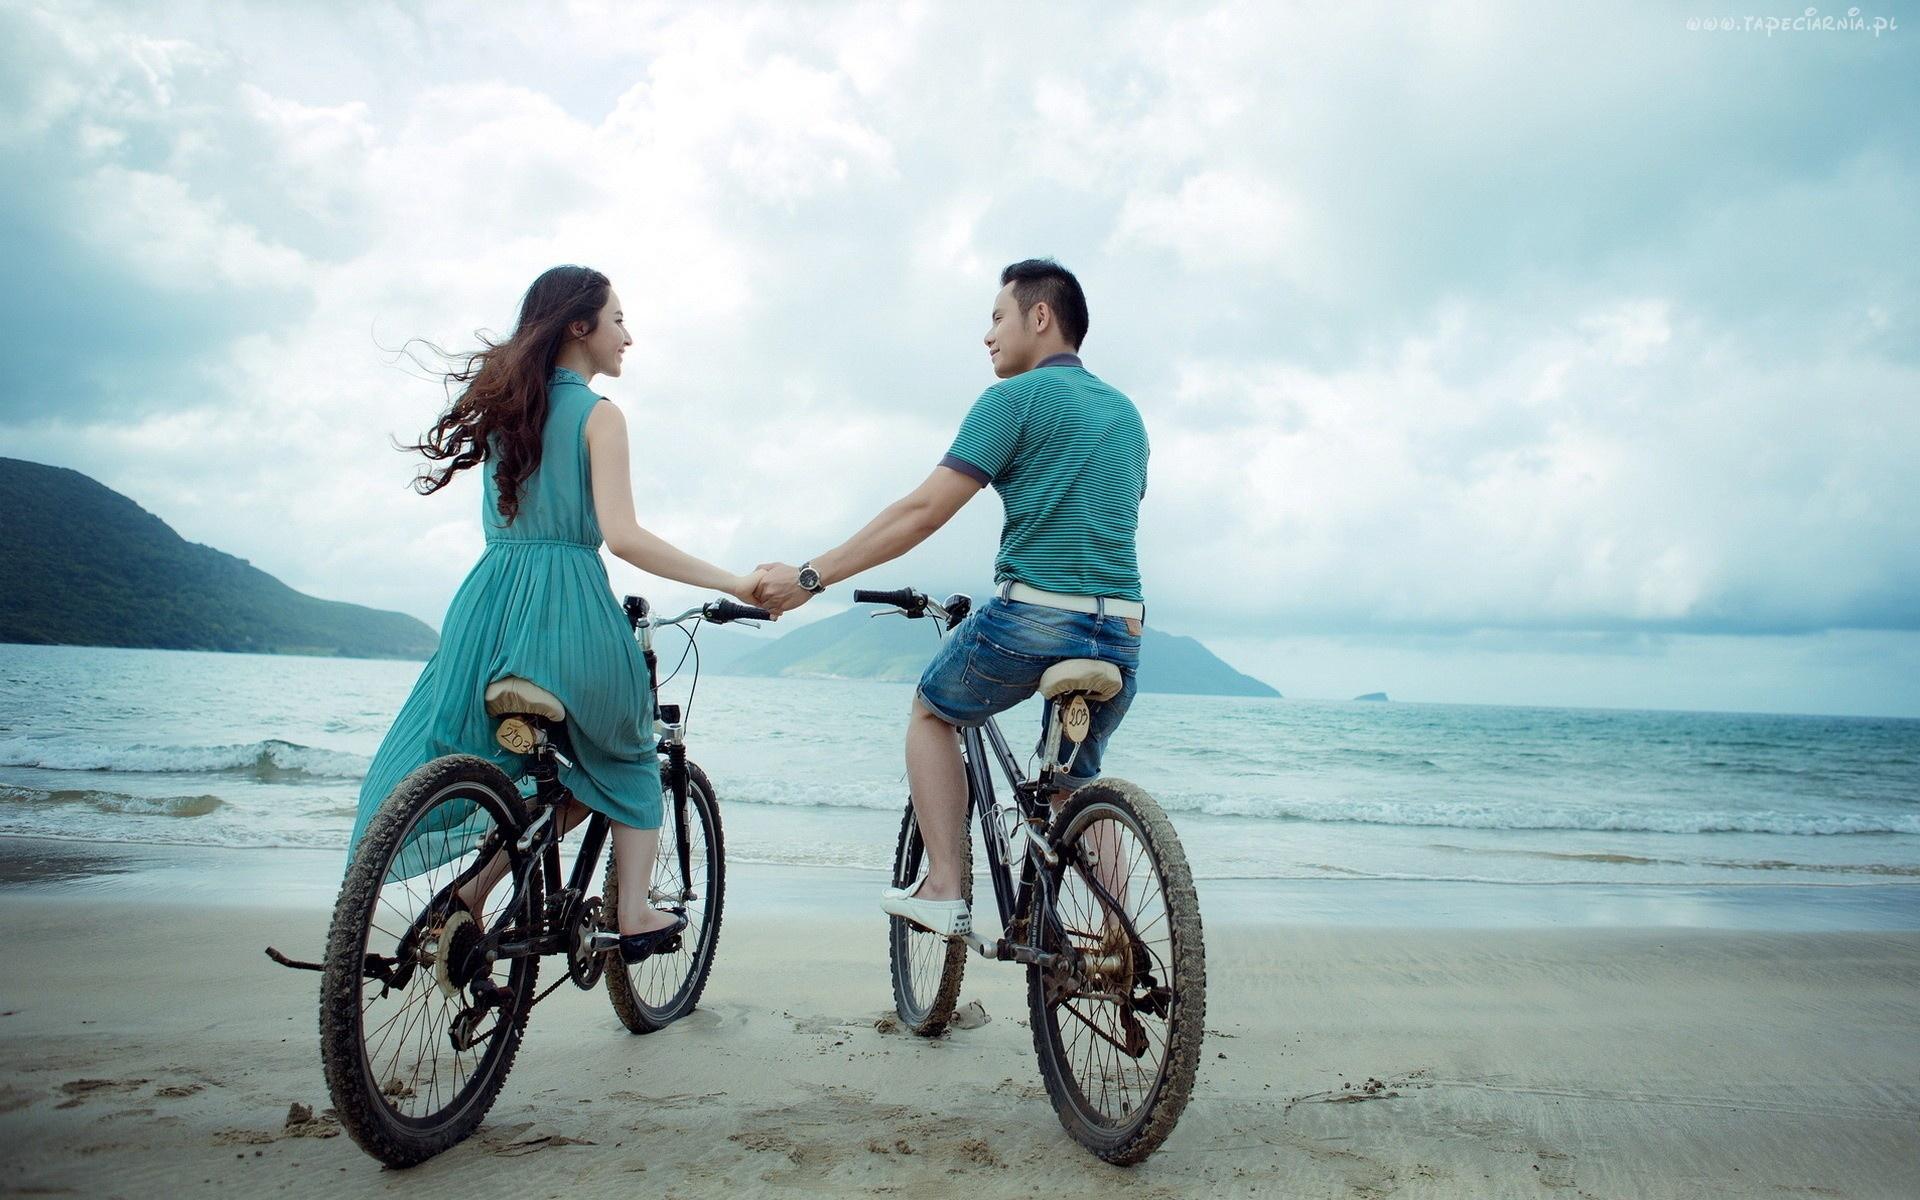 asian-couple-at-beach-wide-46929940.jpg